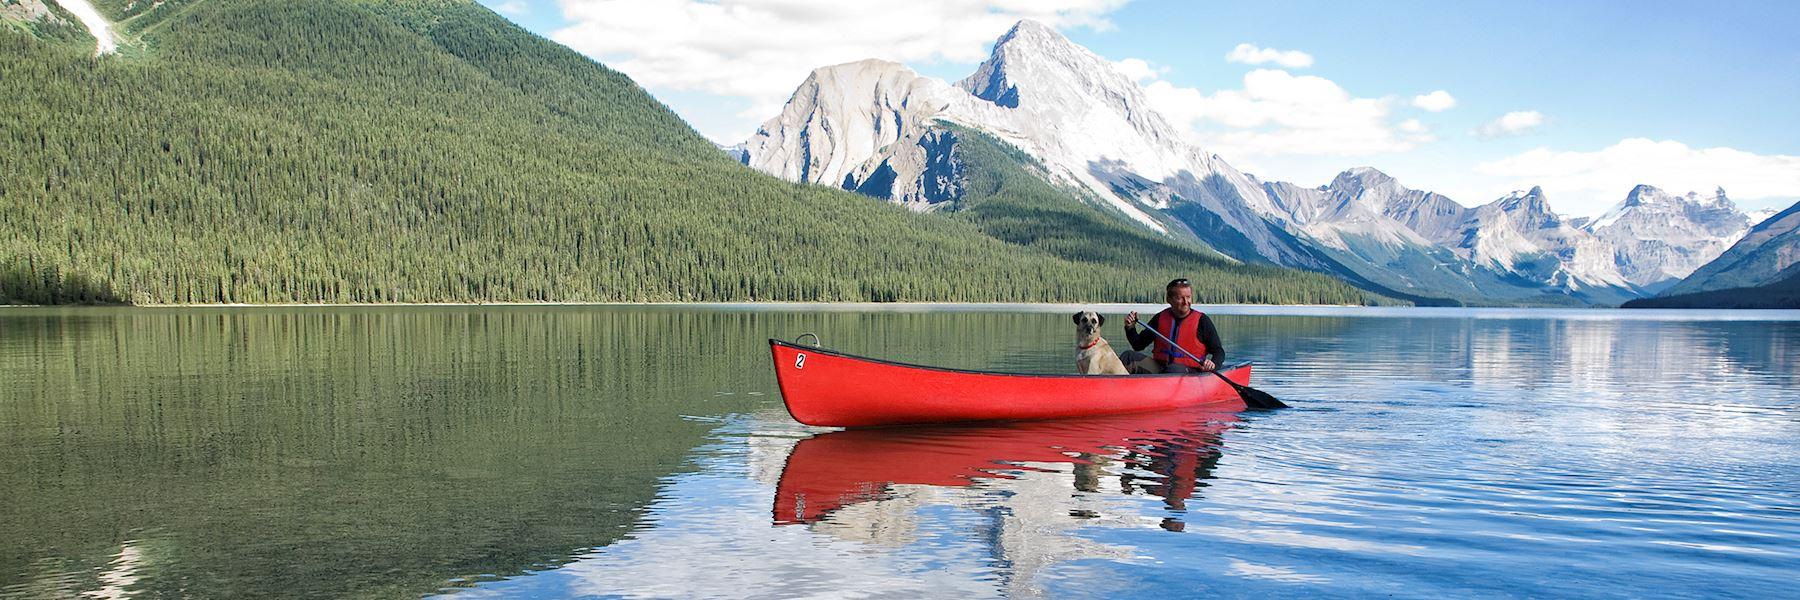 Visit Jasper, Canada